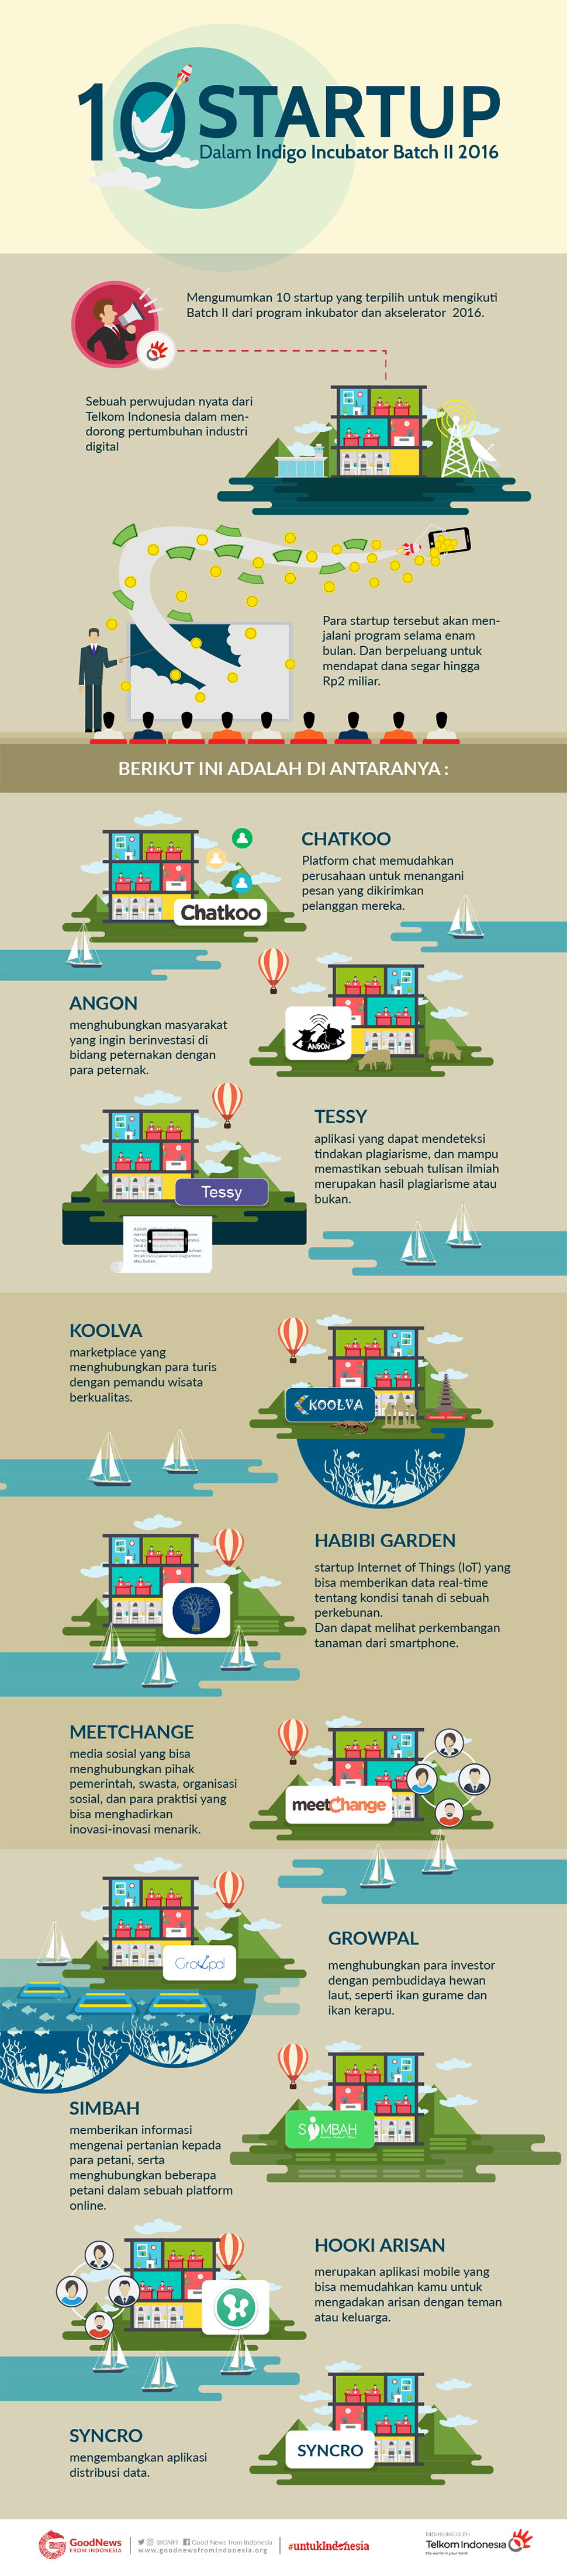 10 Startup masa depan Indonesia